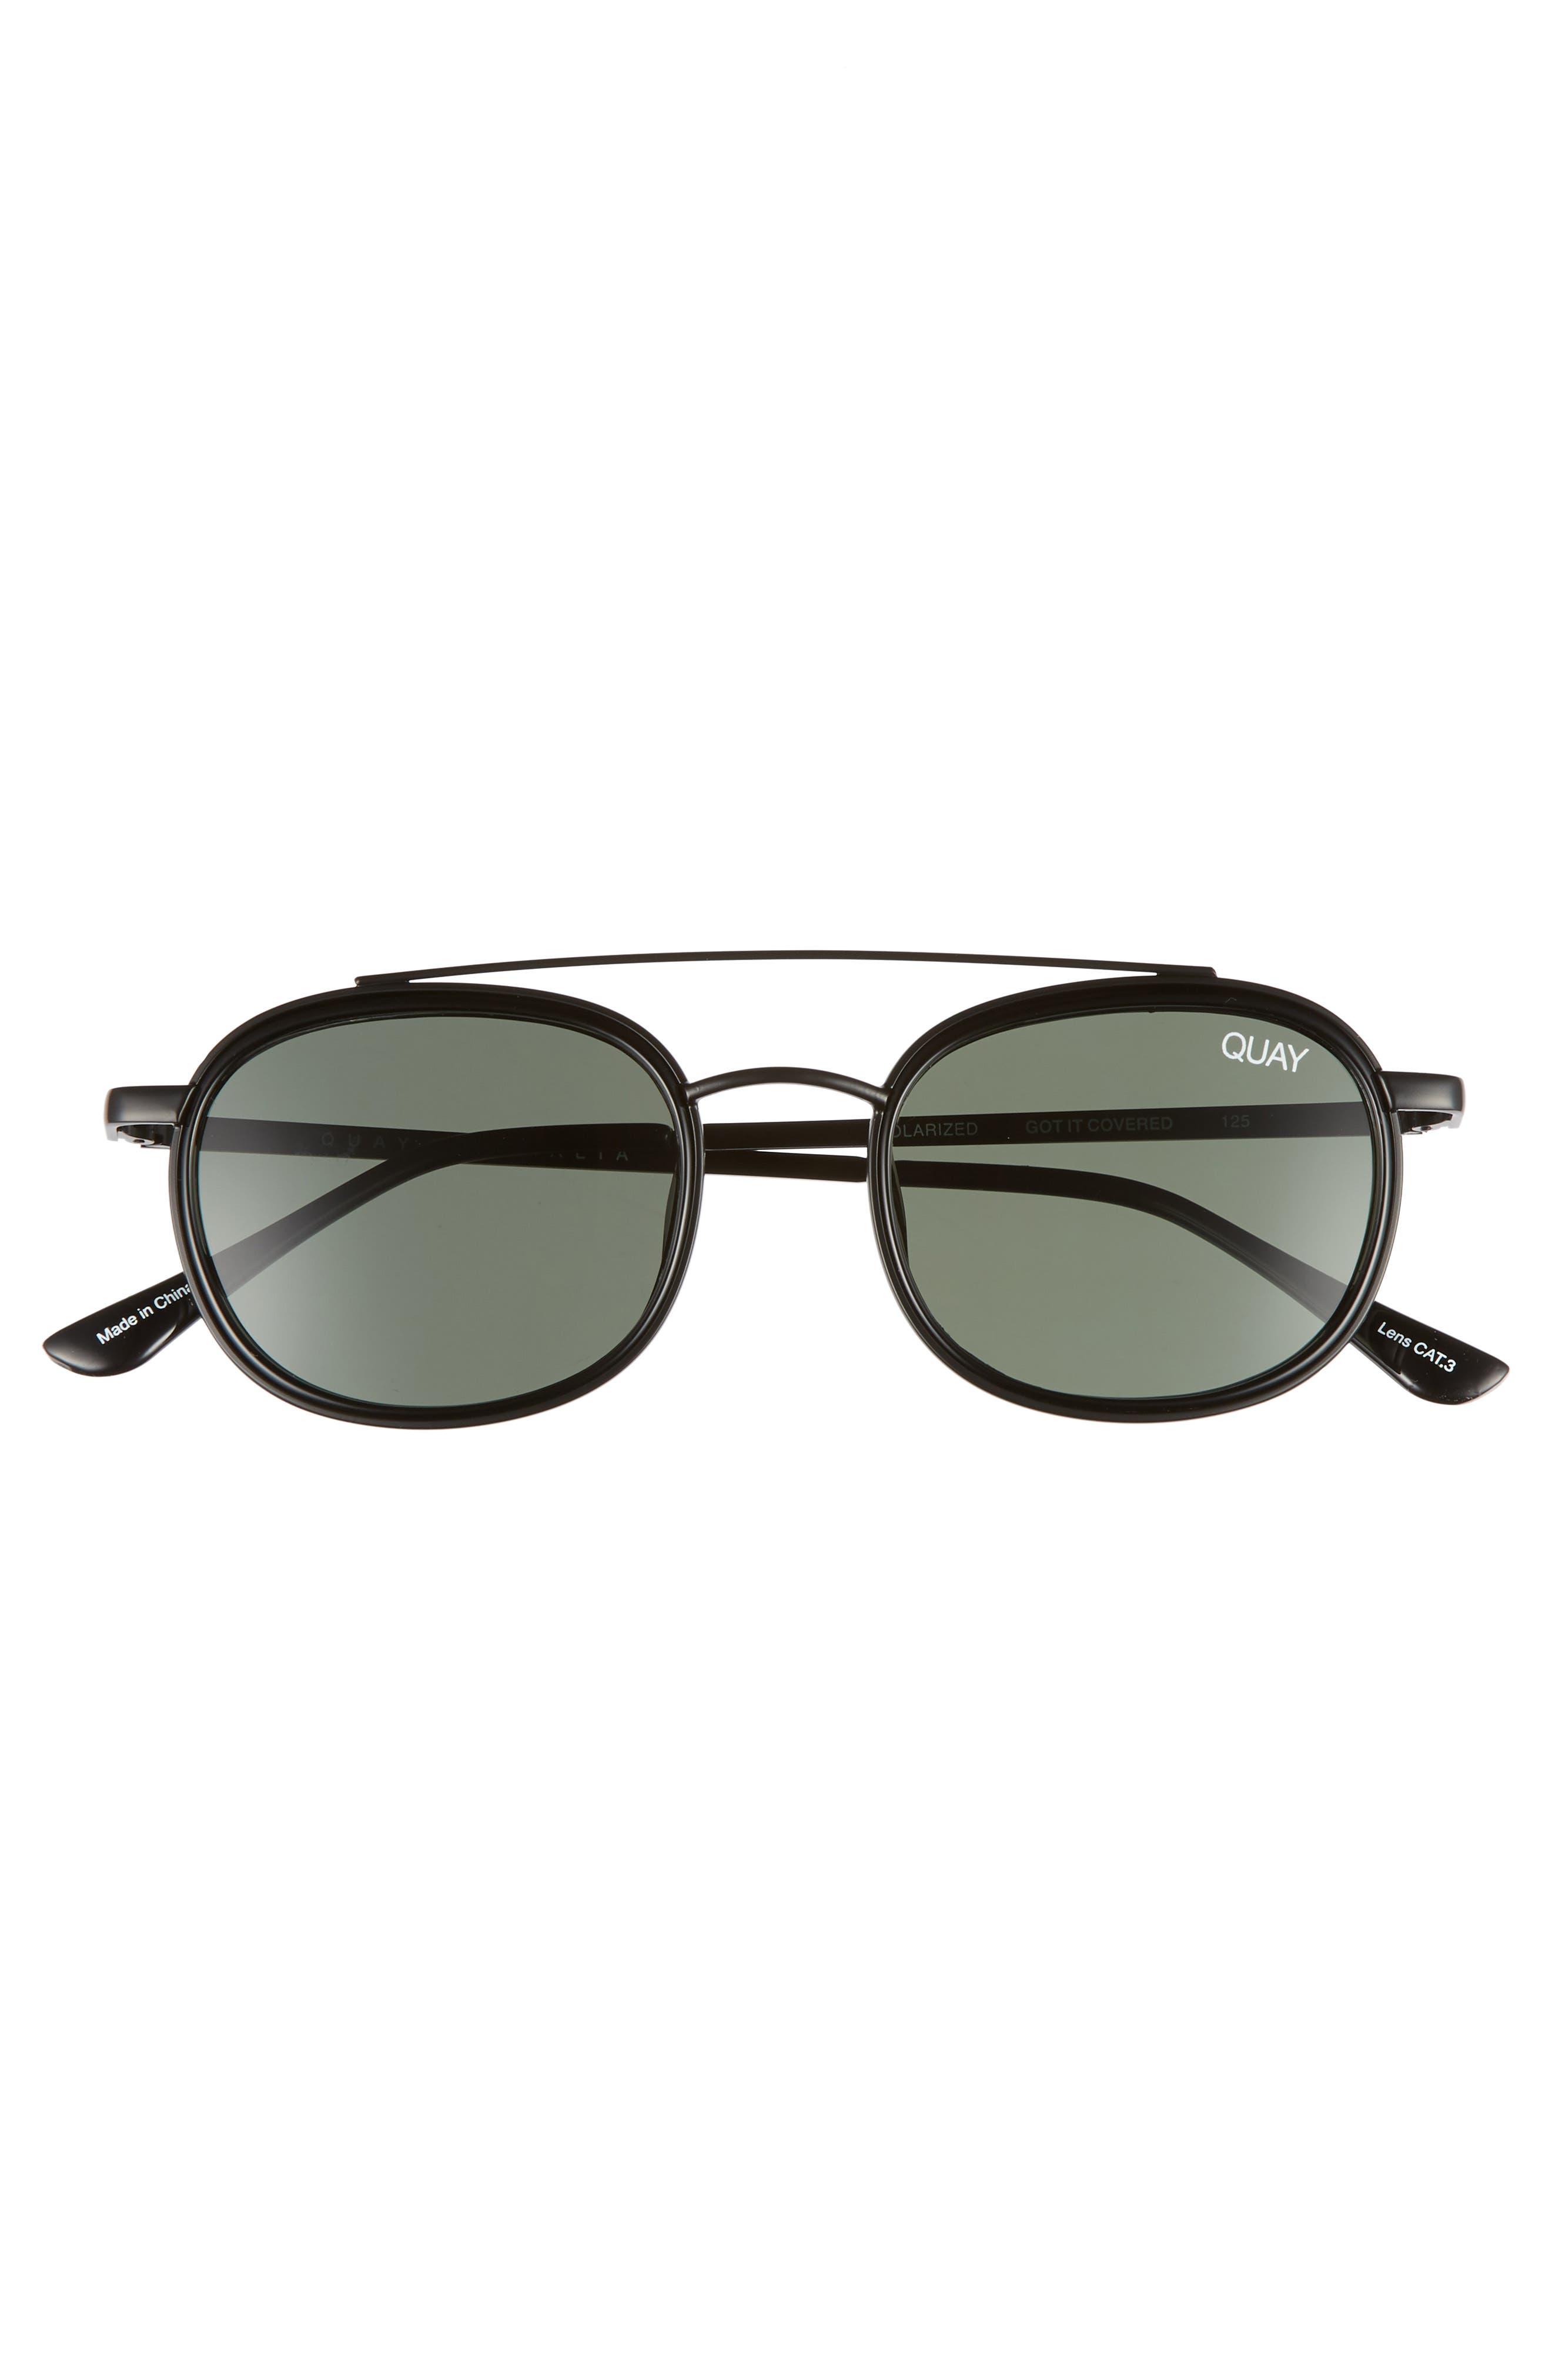 Got It Covered 50mm Polarized Sunglasses,                             Alternate thumbnail 2, color,                             Black / Green Lens